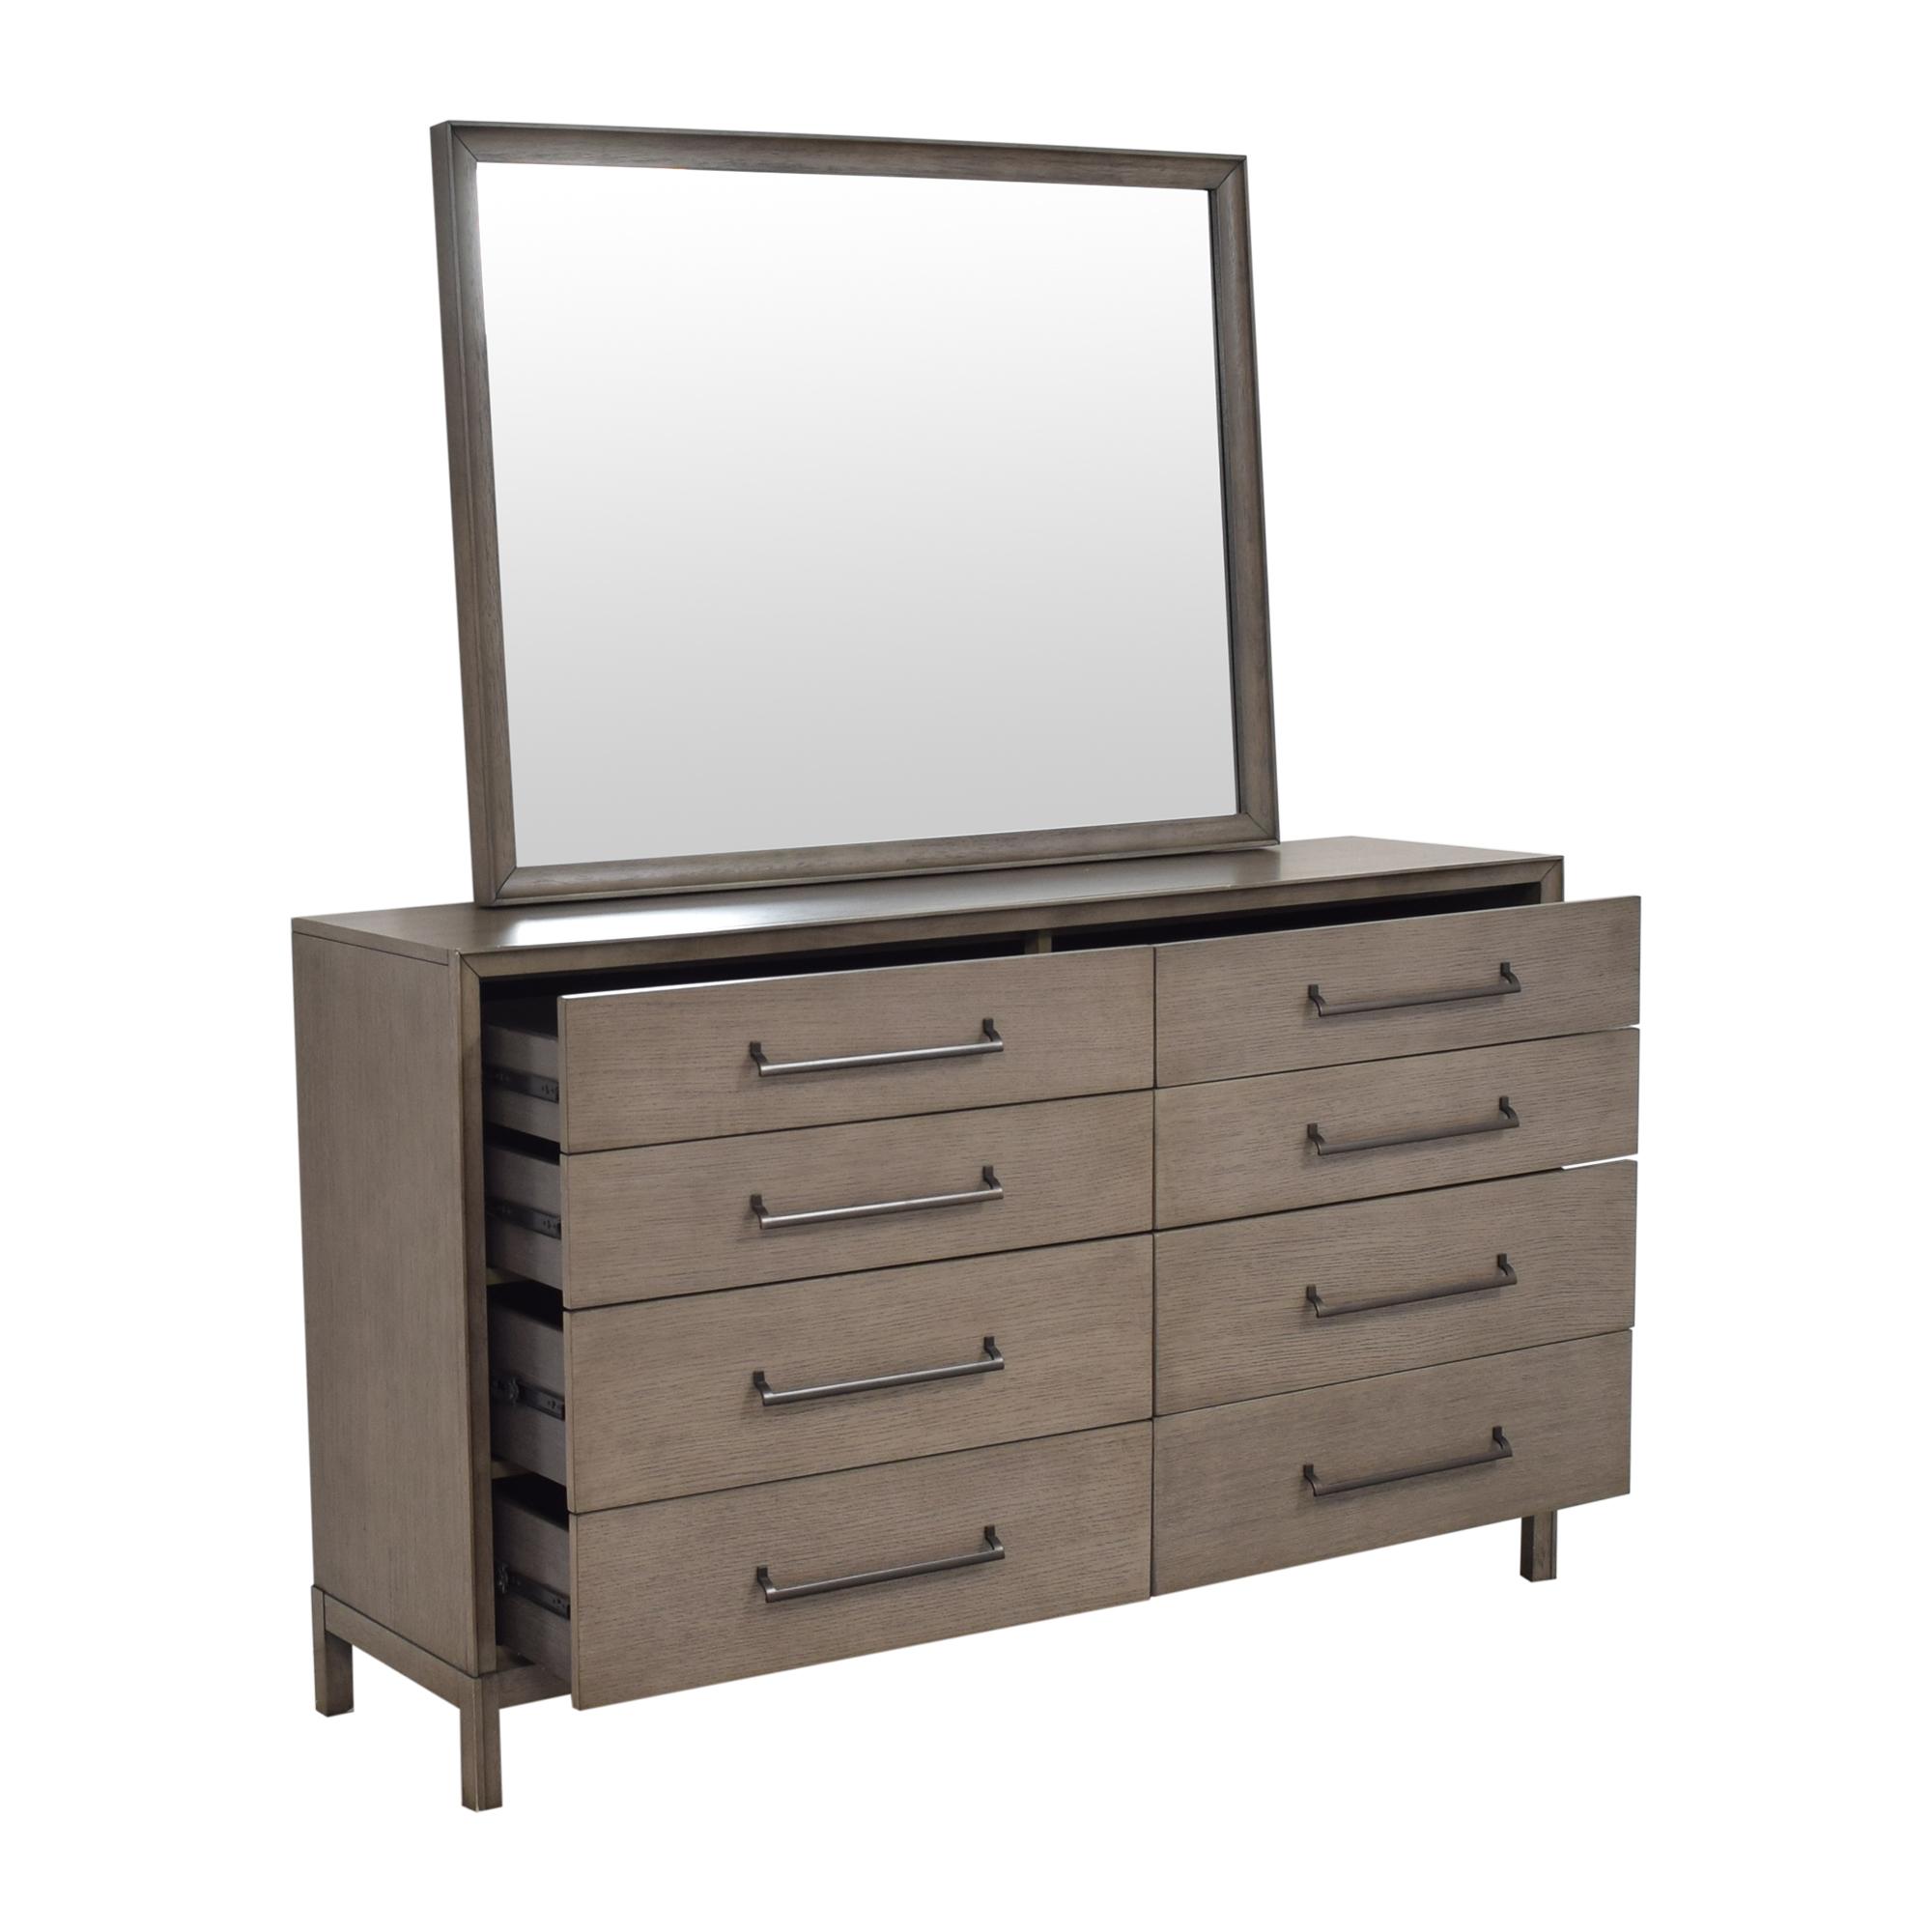 Casana Furniture Casana Double Dresser with Mirror Dressers